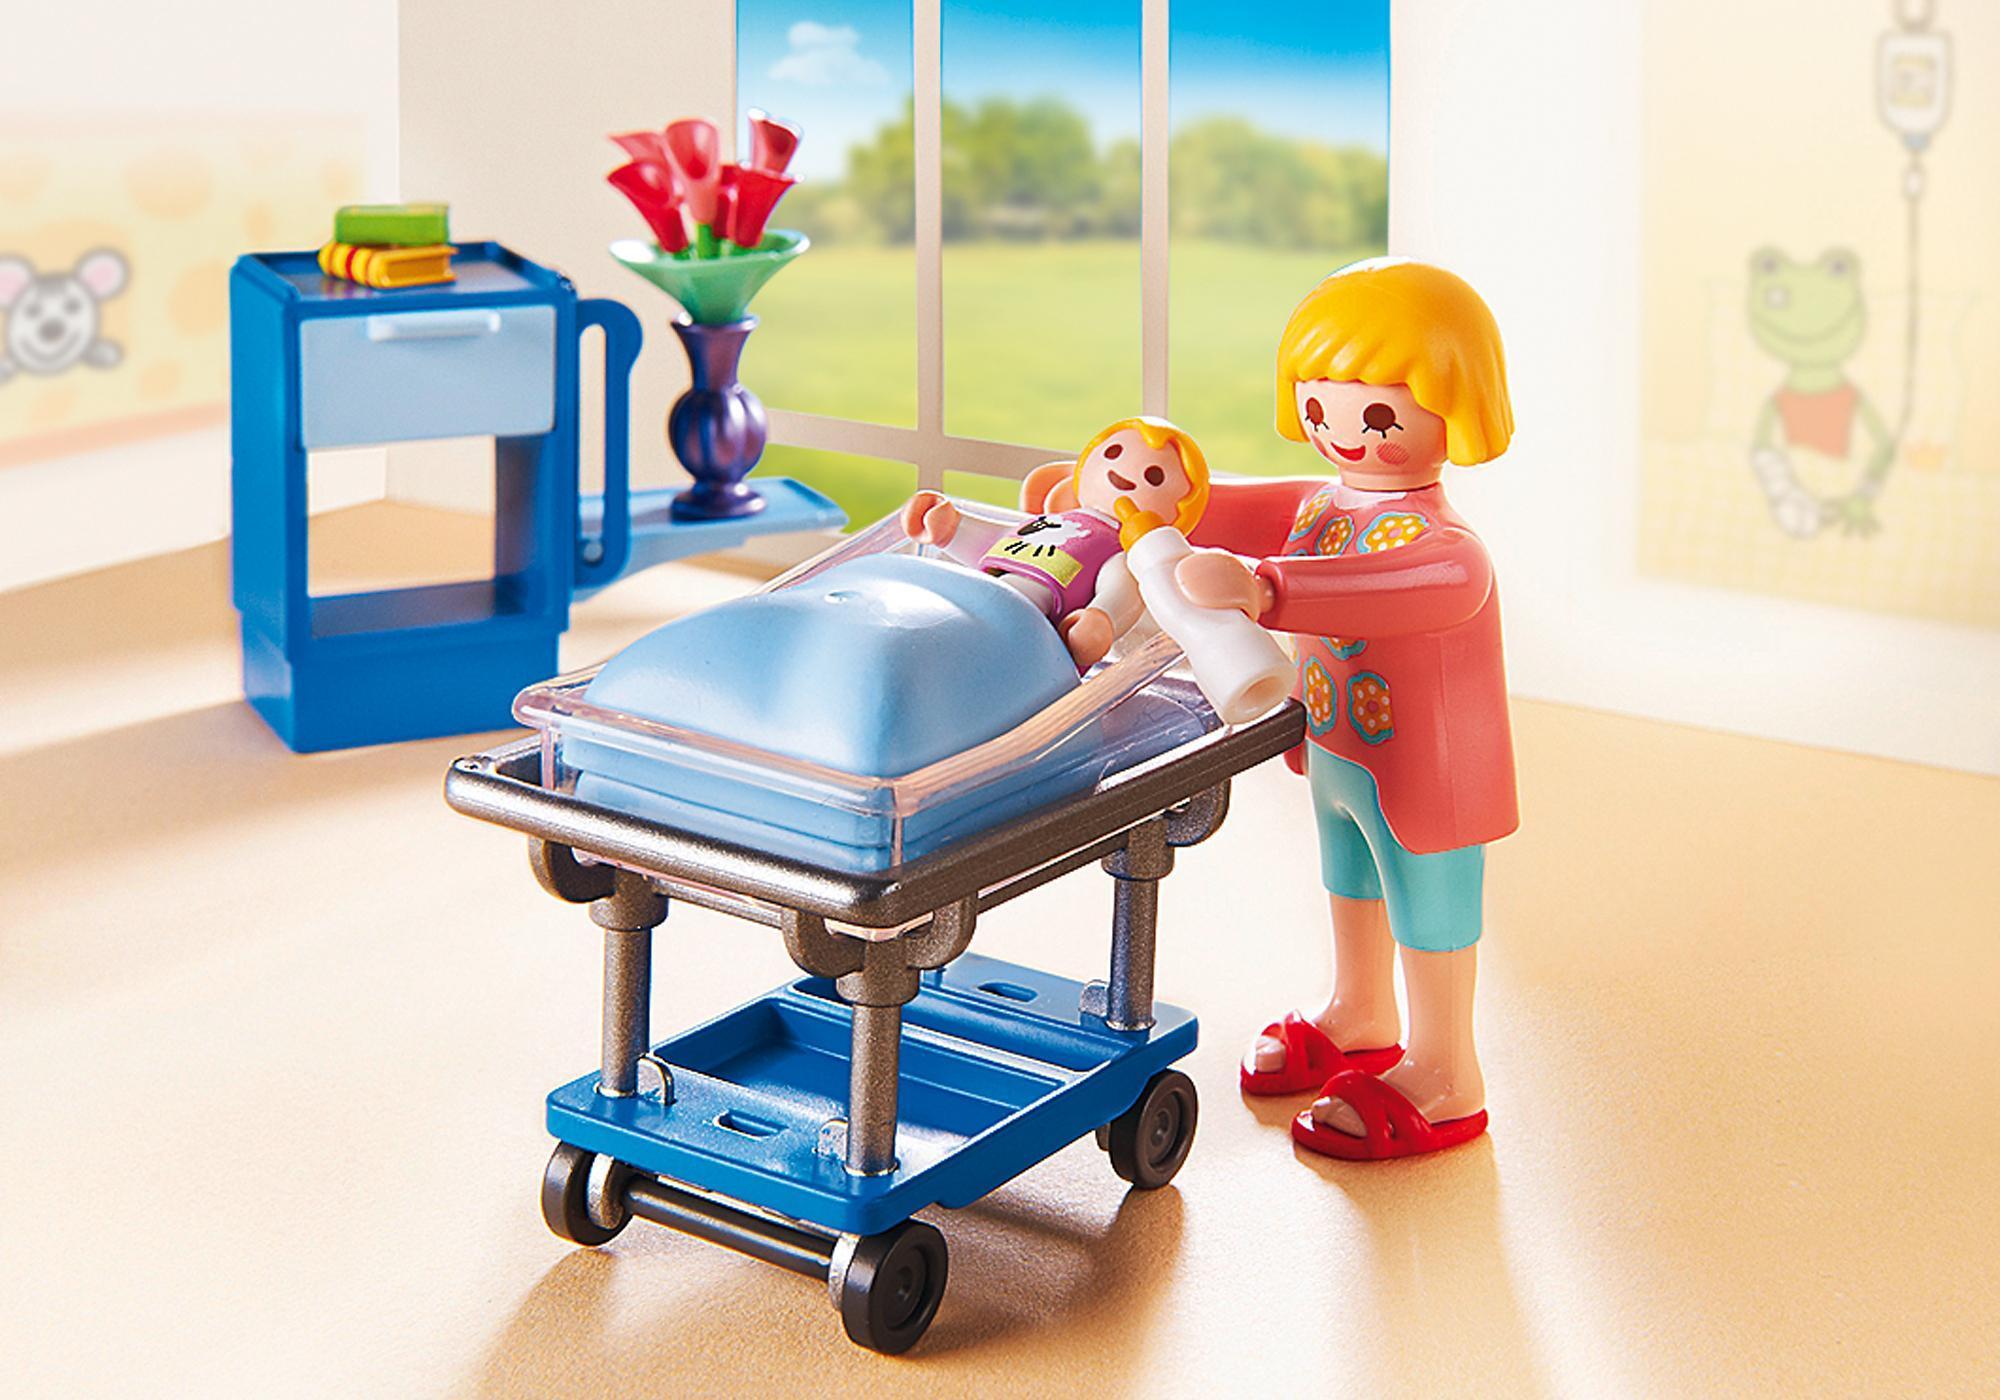 http://media.playmobil.com/i/playmobil/6660_product_extra1/Maternity Room